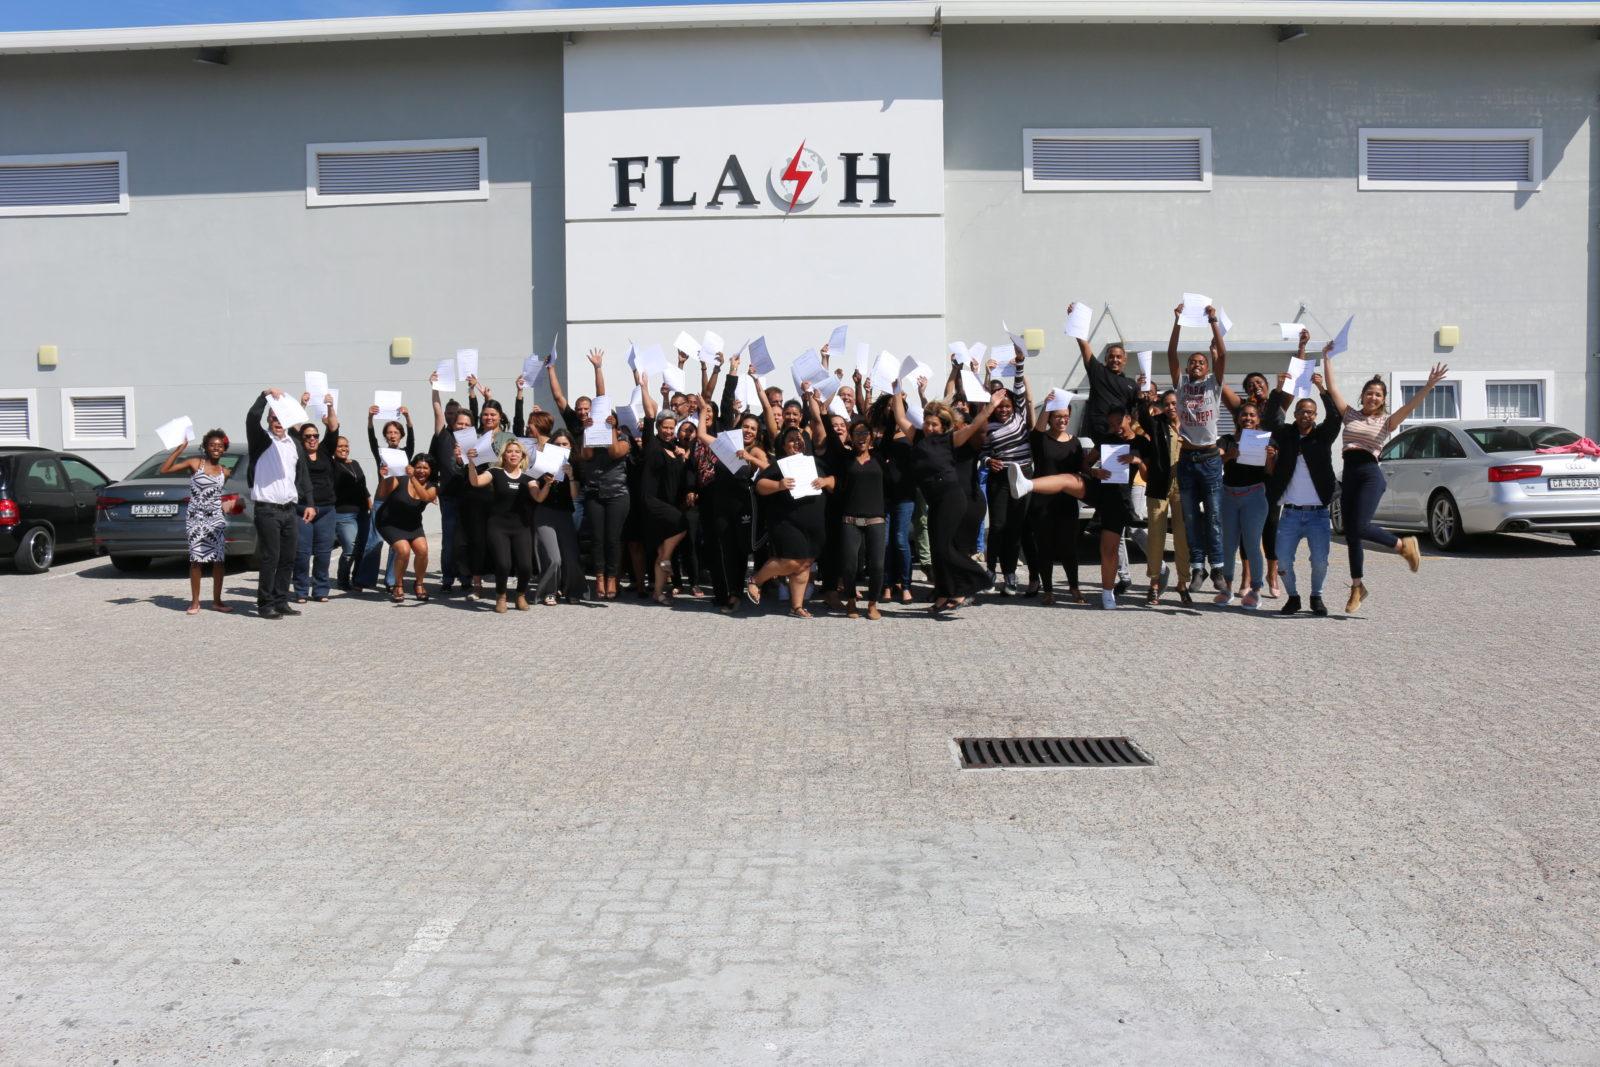 Flash Group Photo